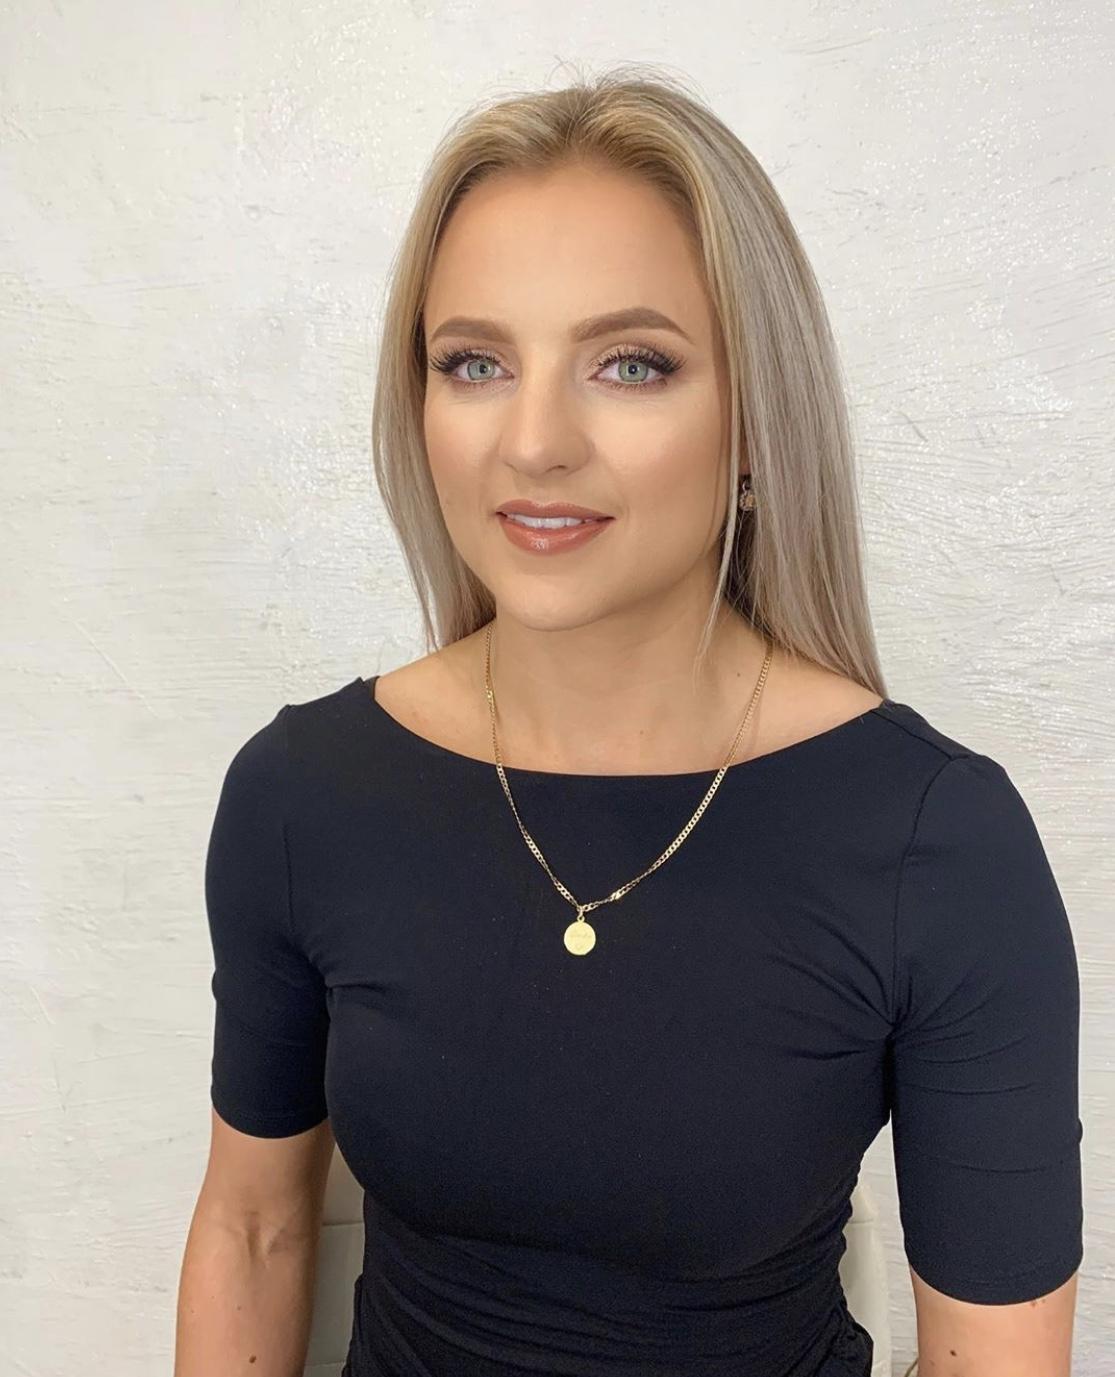 Jumestaja Krista Ameljušenko